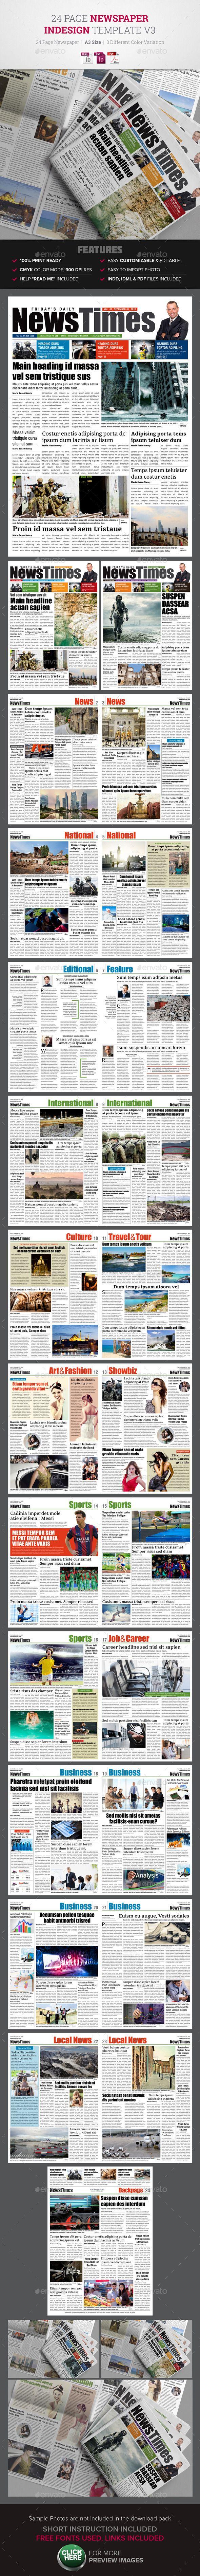 24 Page Newspaper Indesign Template #design Download: http://graphicriver.net/item/24-page-newspaper-indesign-template-v3-/12240434?ref=ksioks